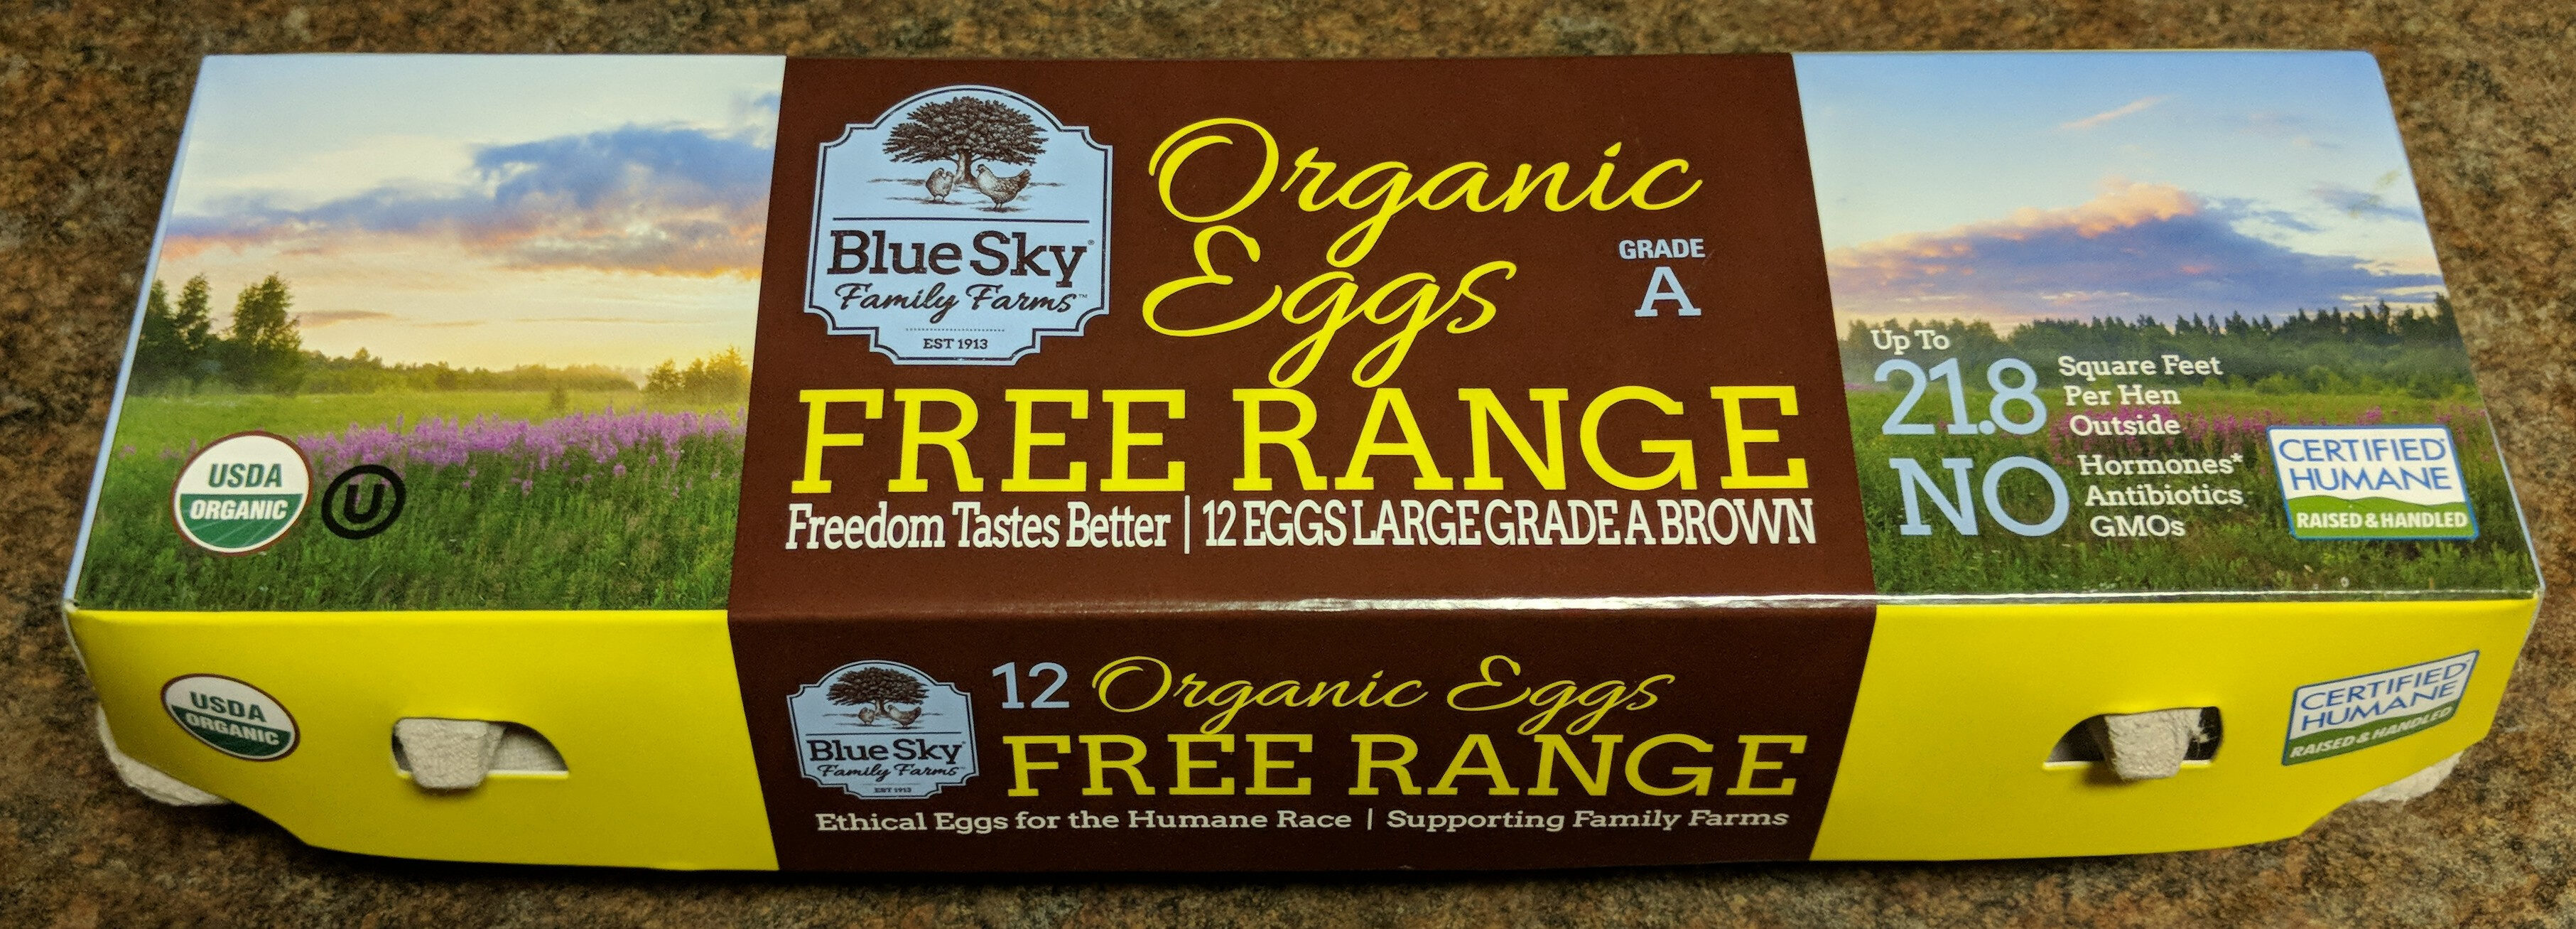 Organic Eggs Free Range - Product